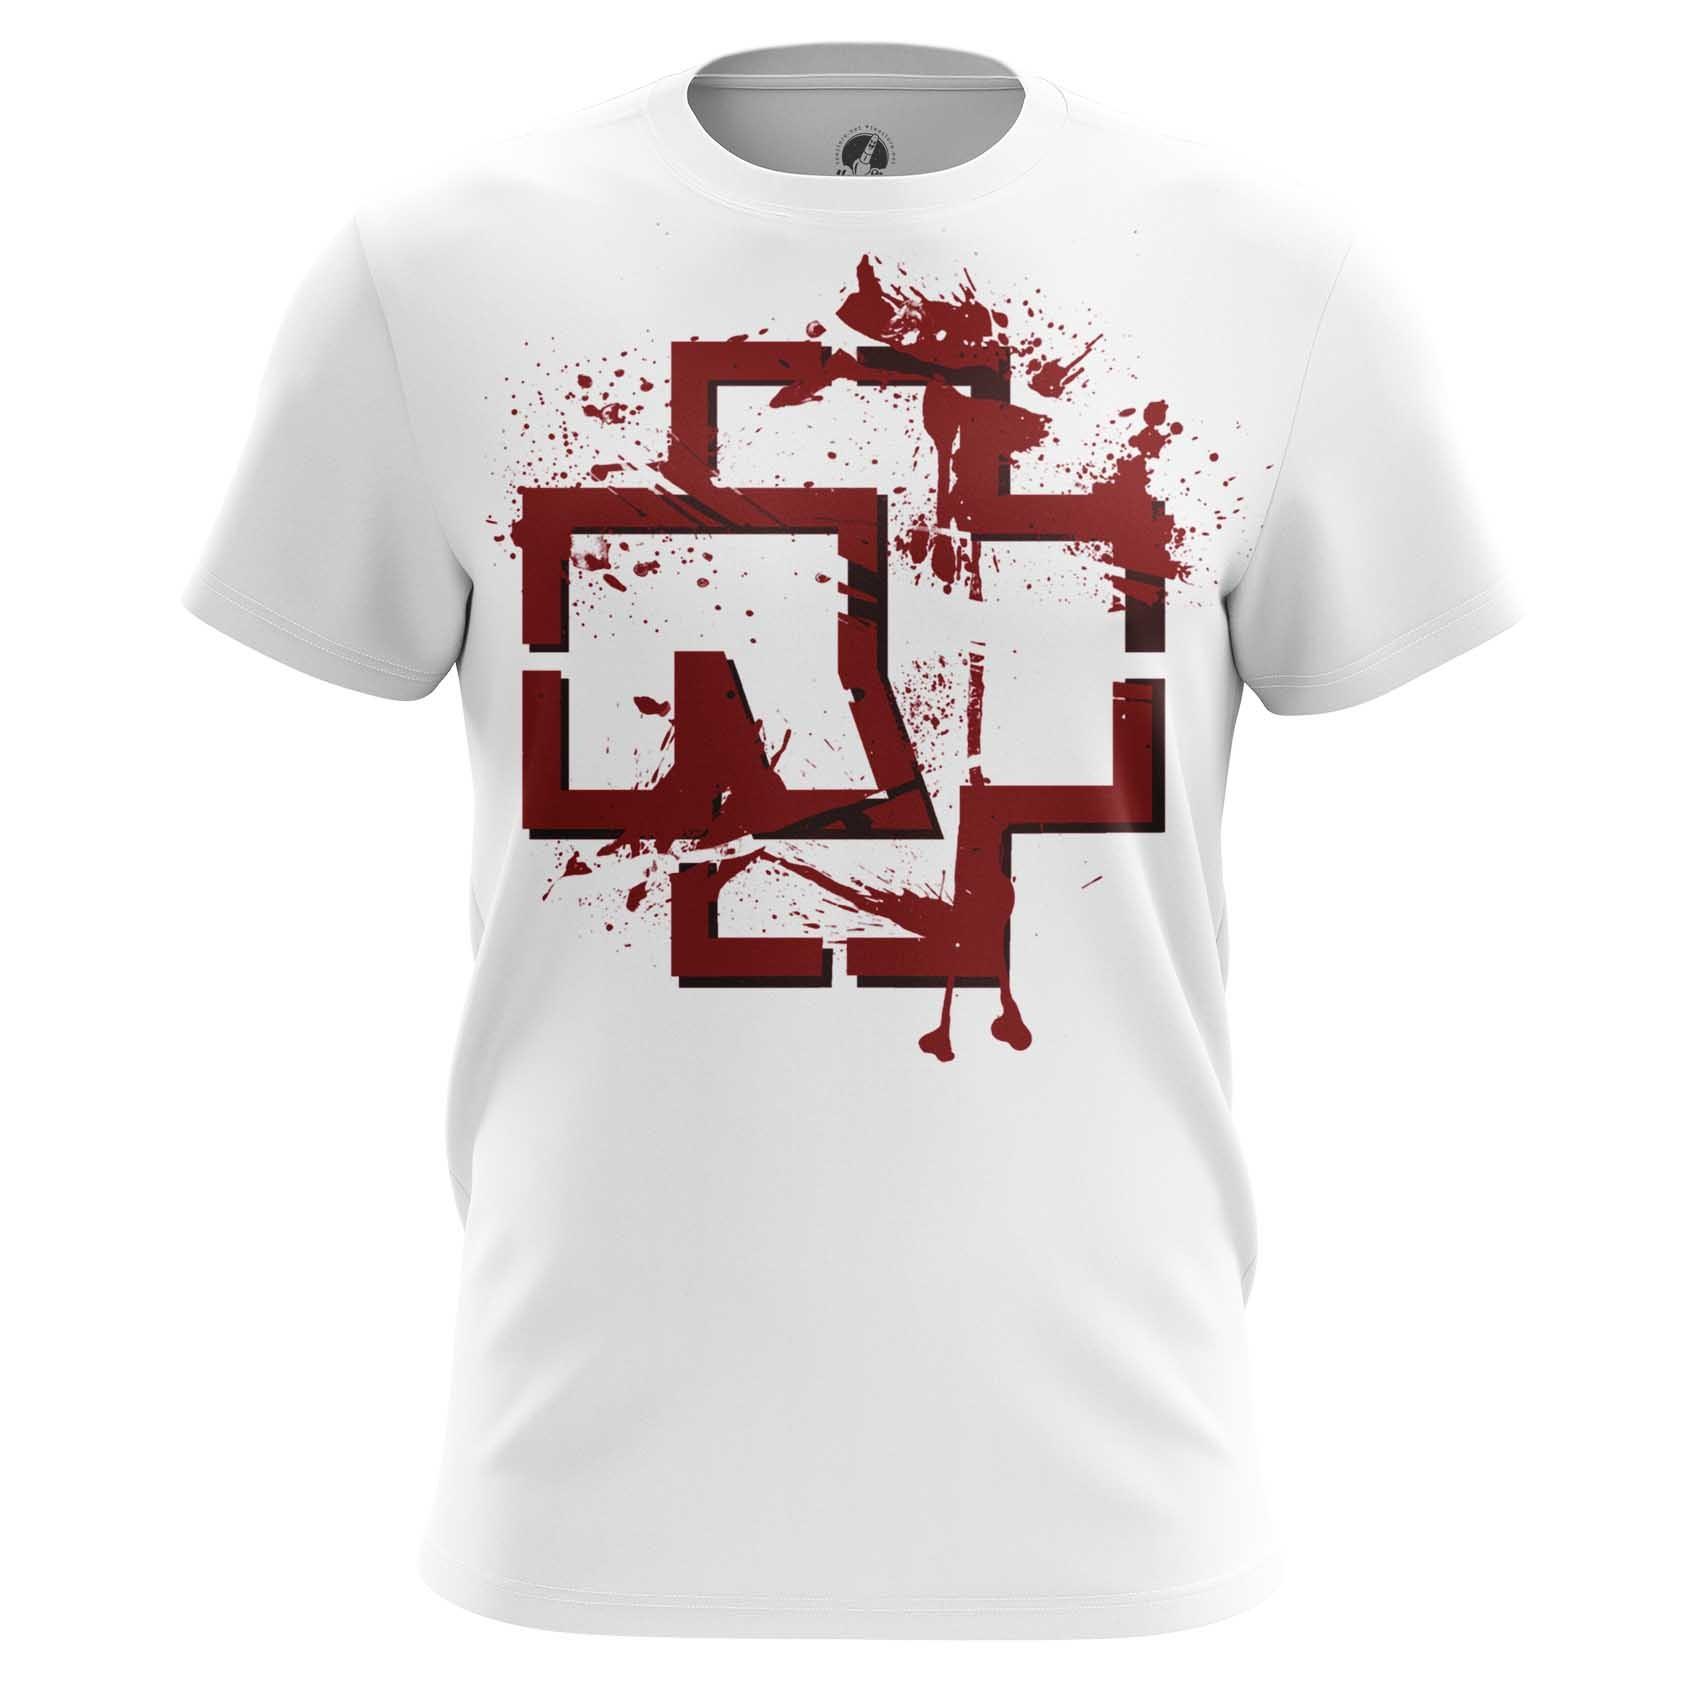 Merch Tank Rammstein Band Vest